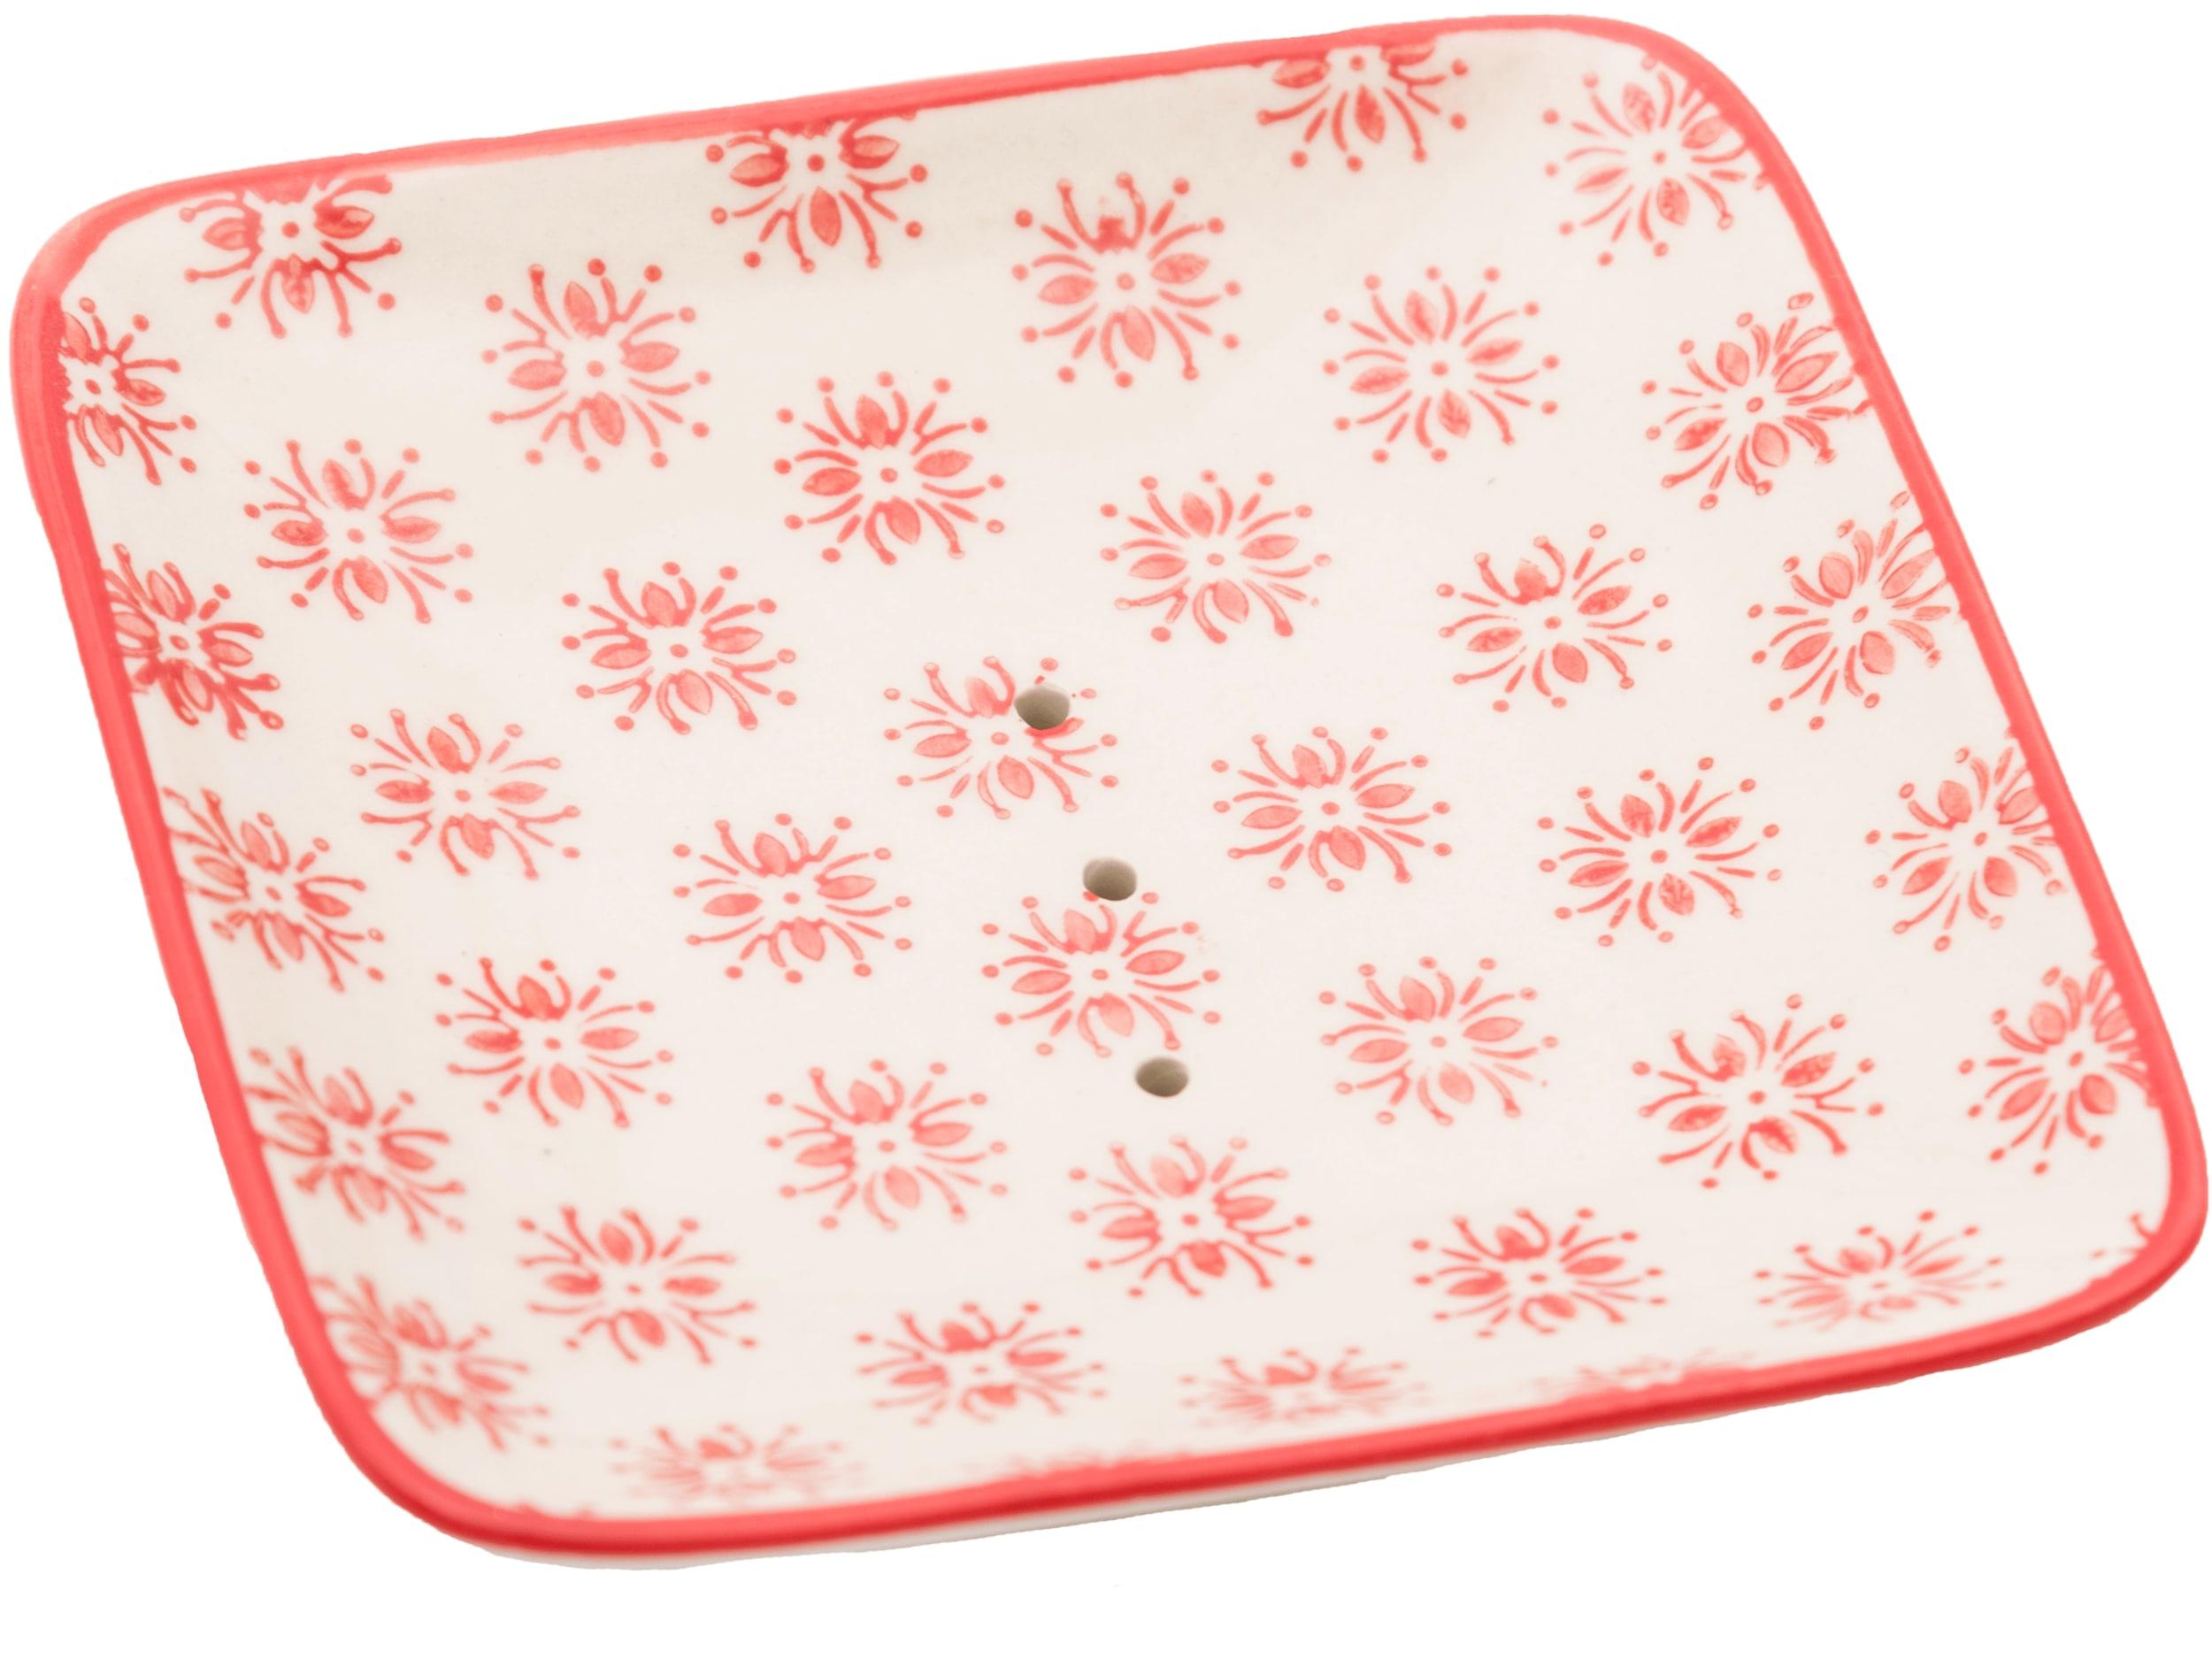 Seifenschale quadratisch - rot